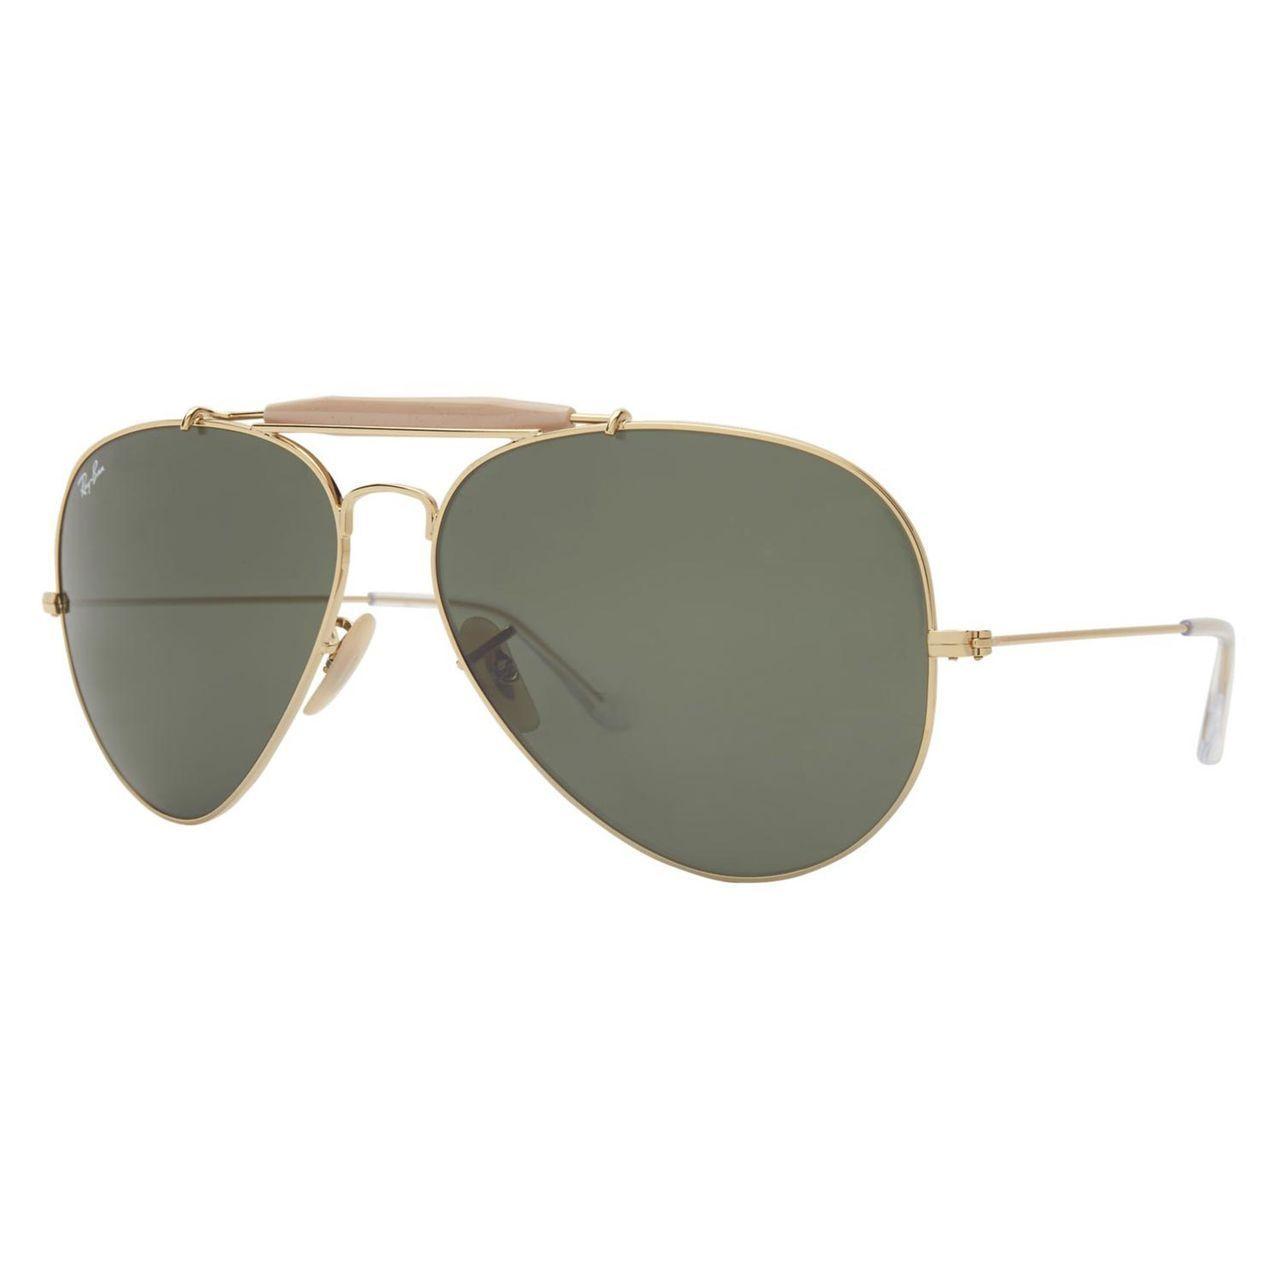 373abeec4c658 Ray-Ban Aviator Sunglasses RB 3029 L2112, Frame, Green Lens   wear ...